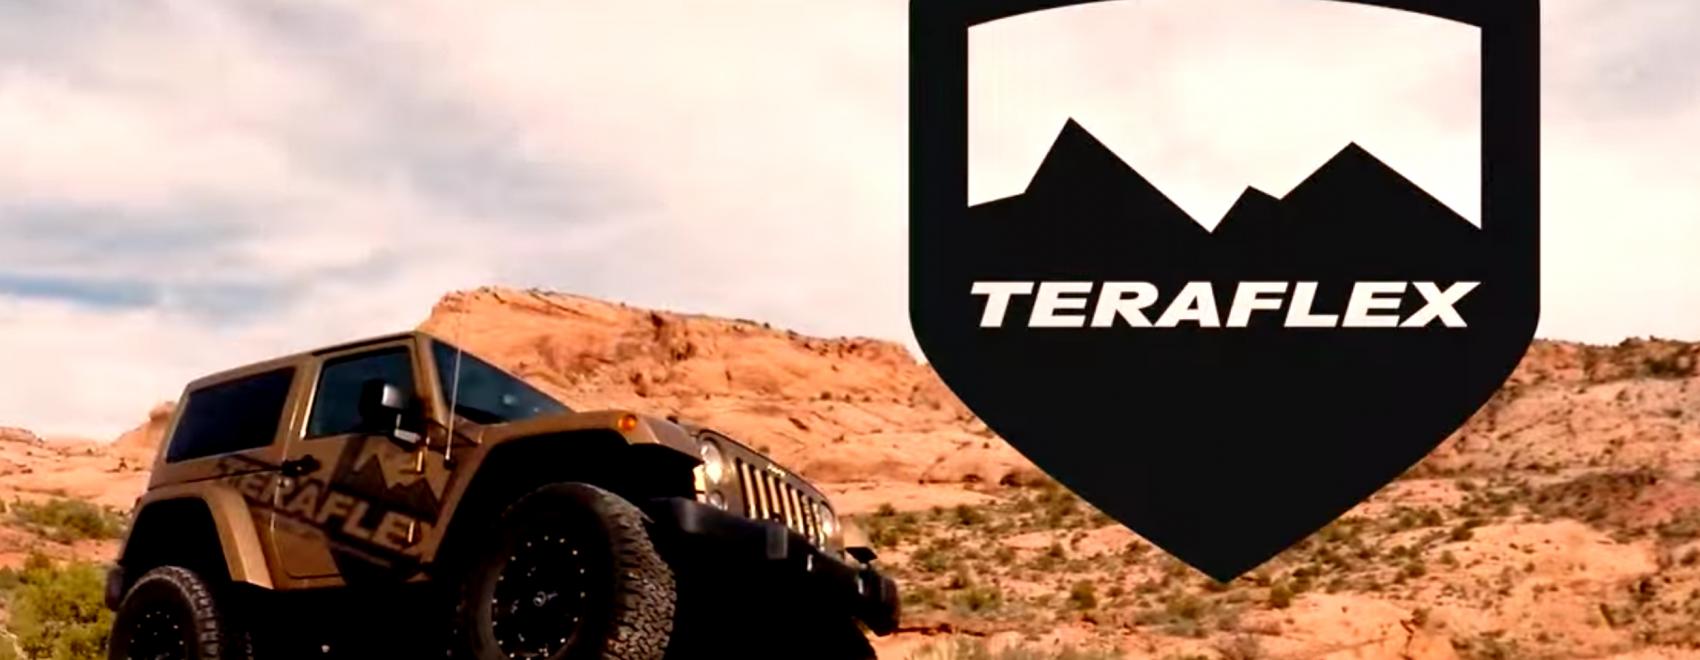 TeraFlex a Jeep Aftermarket product company